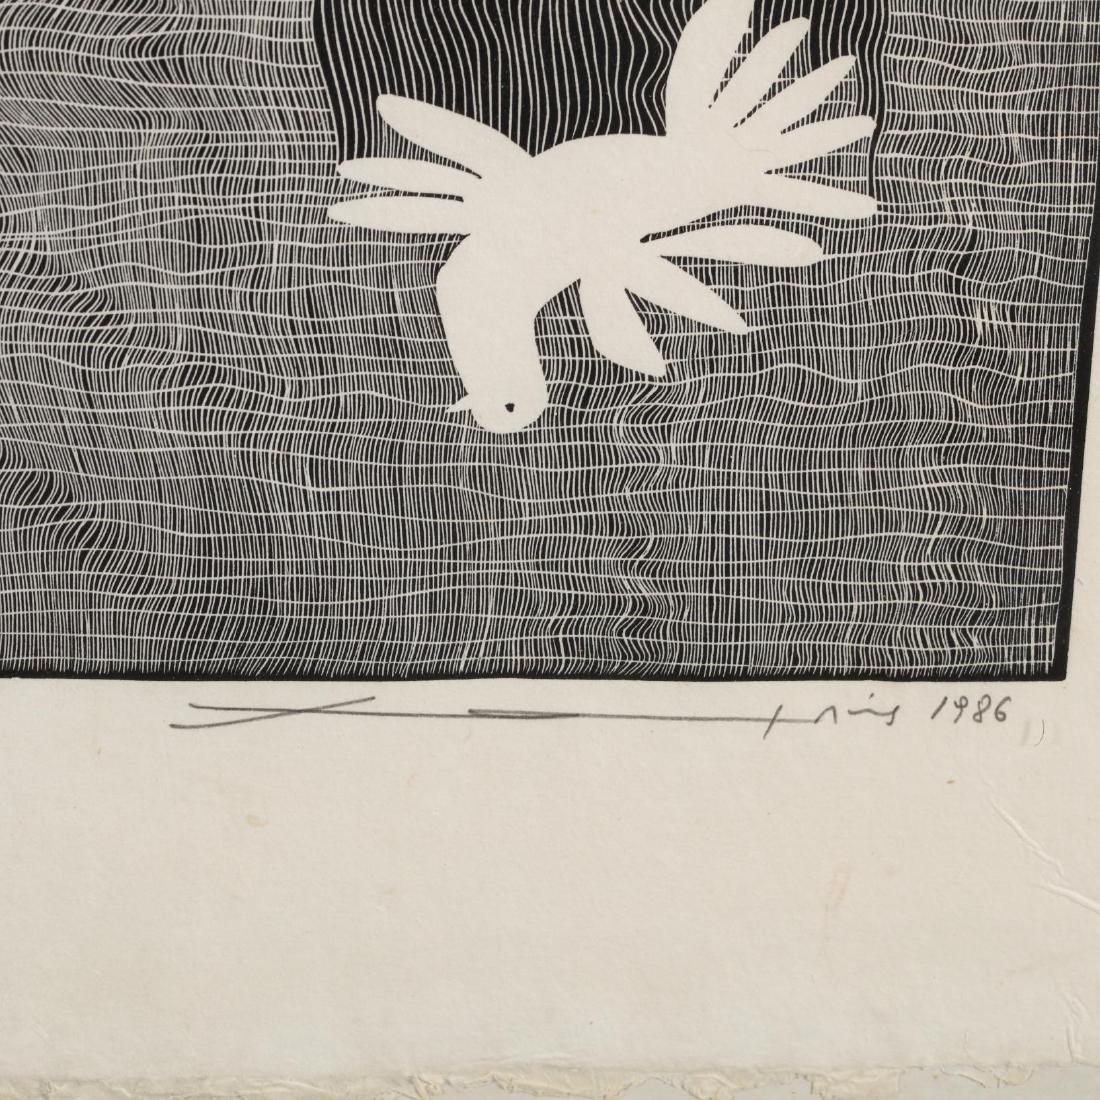 Hambis Tsangaris (Cypriot, b. 1947), Two Visions of - 6